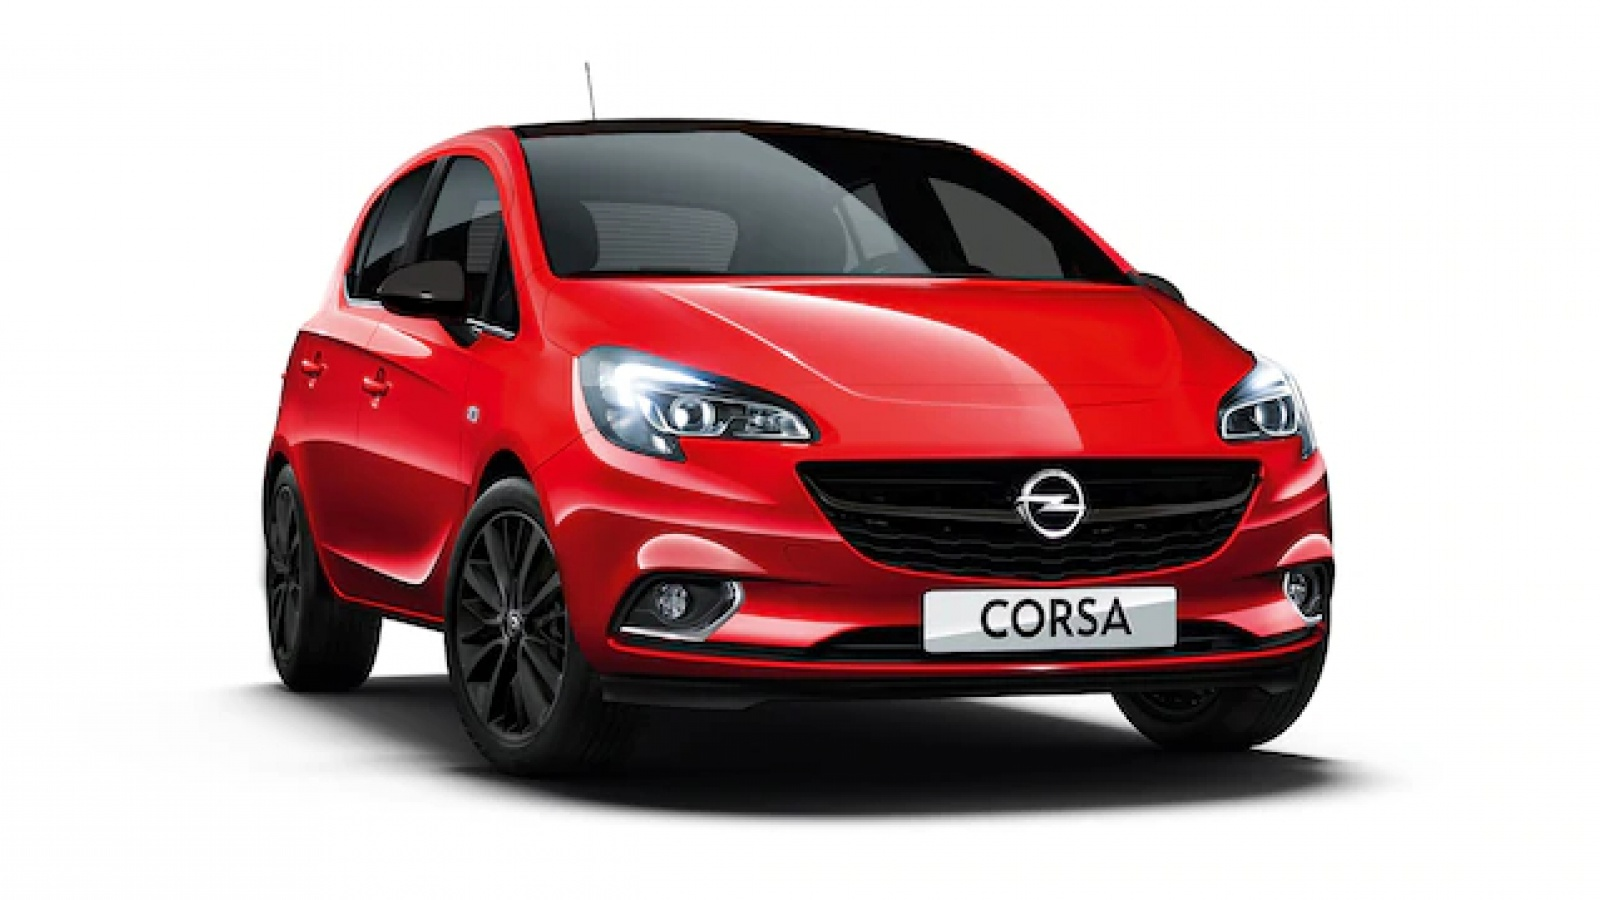 Opel Corsa 1.2 70 CV Advance 5 porte